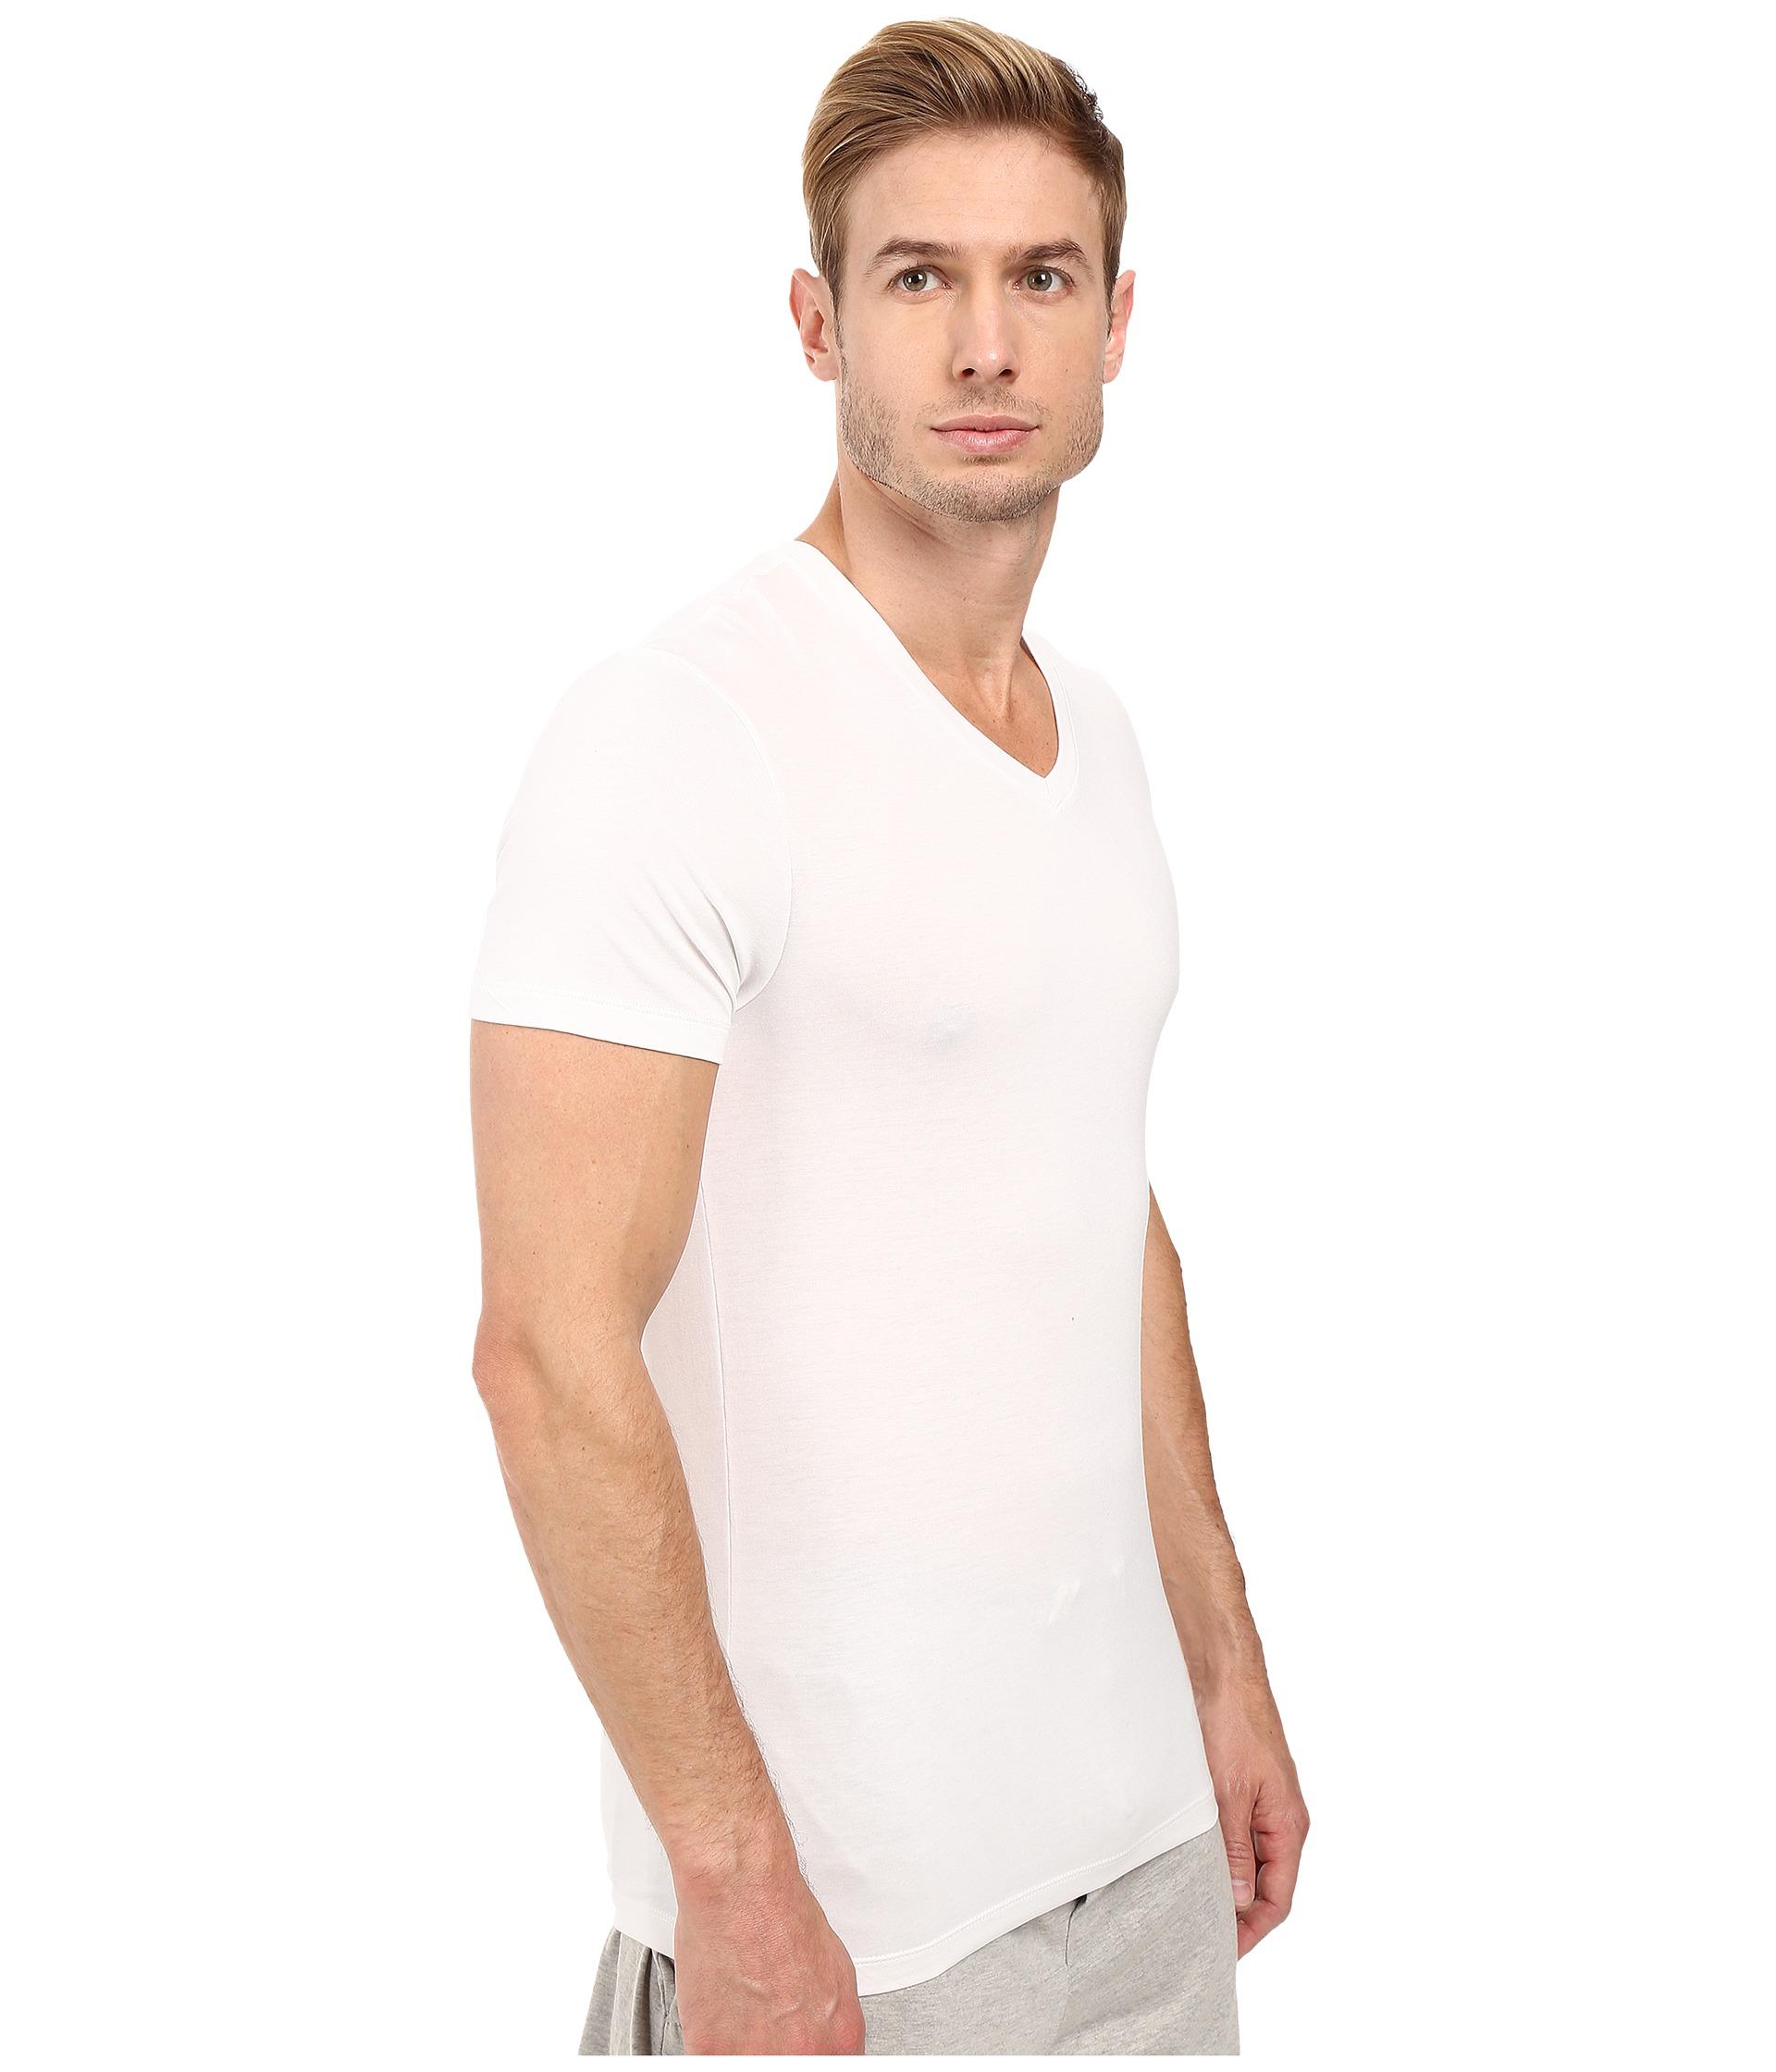 michael kors luxury modal v neck t shirt free. Black Bedroom Furniture Sets. Home Design Ideas